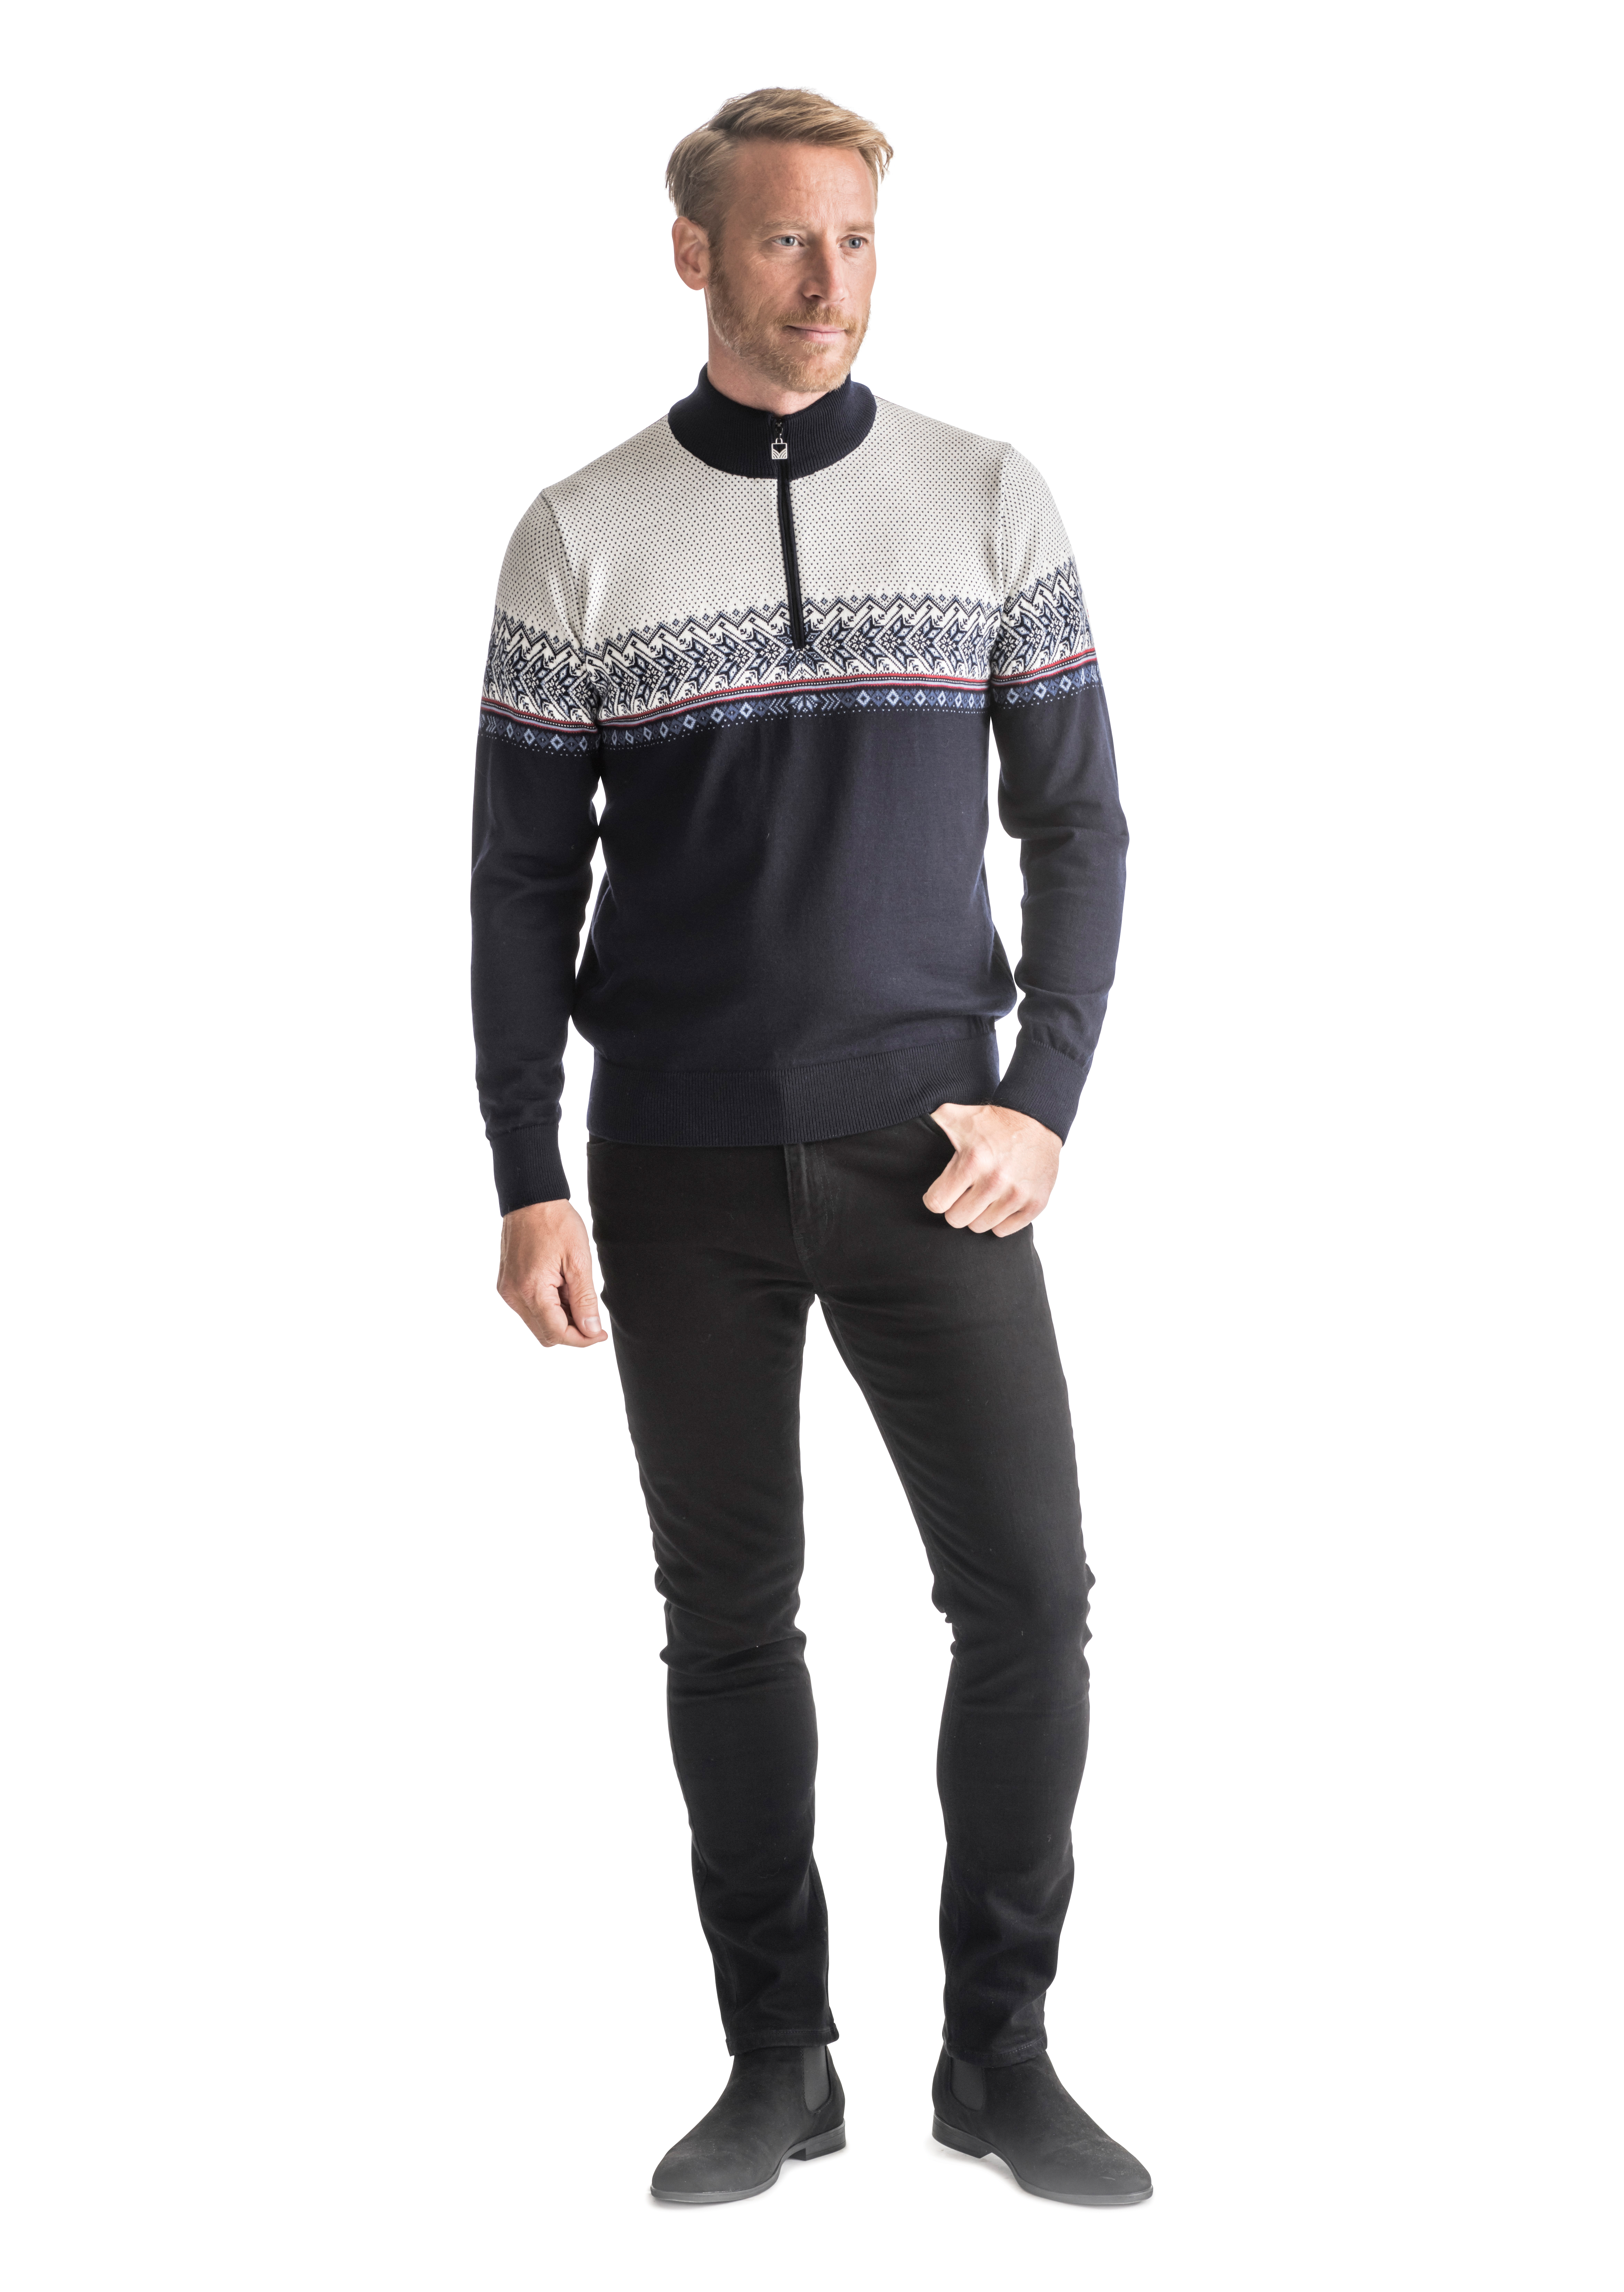 Hovden Masculine Sweater